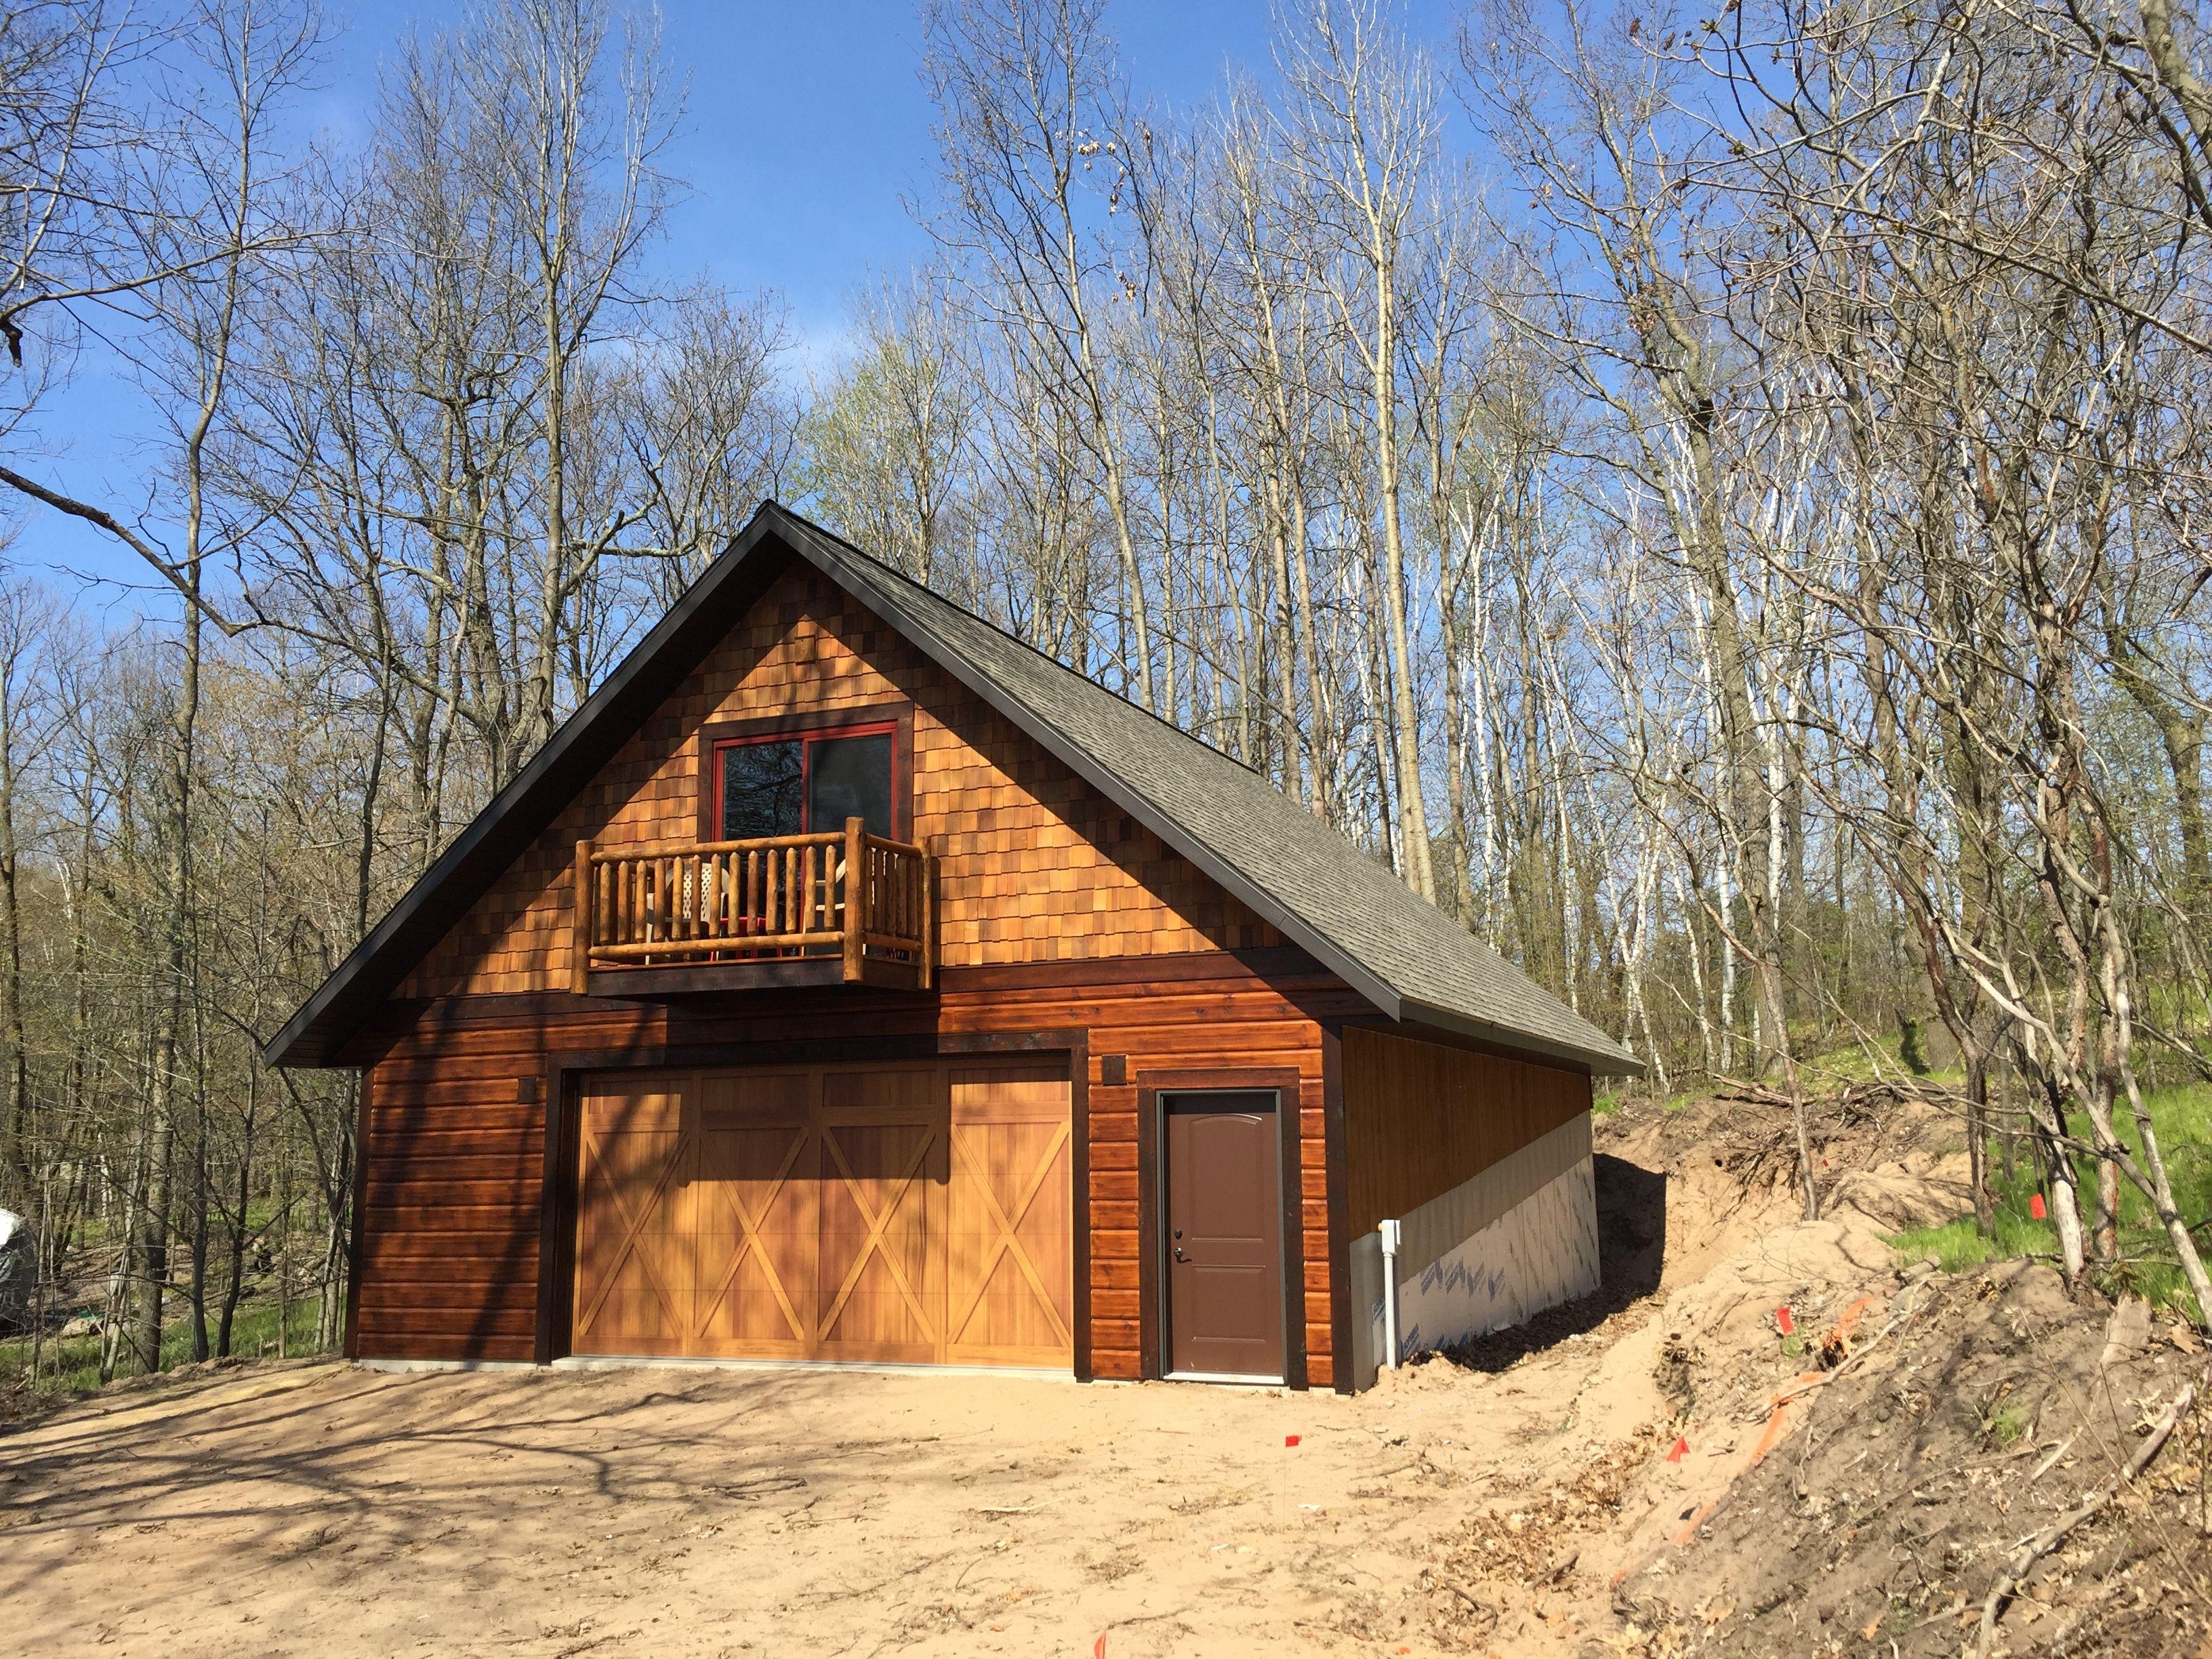 30x36 Garage And Bunkroom Garage Plans With Loft Carriage House Plans Garage Design